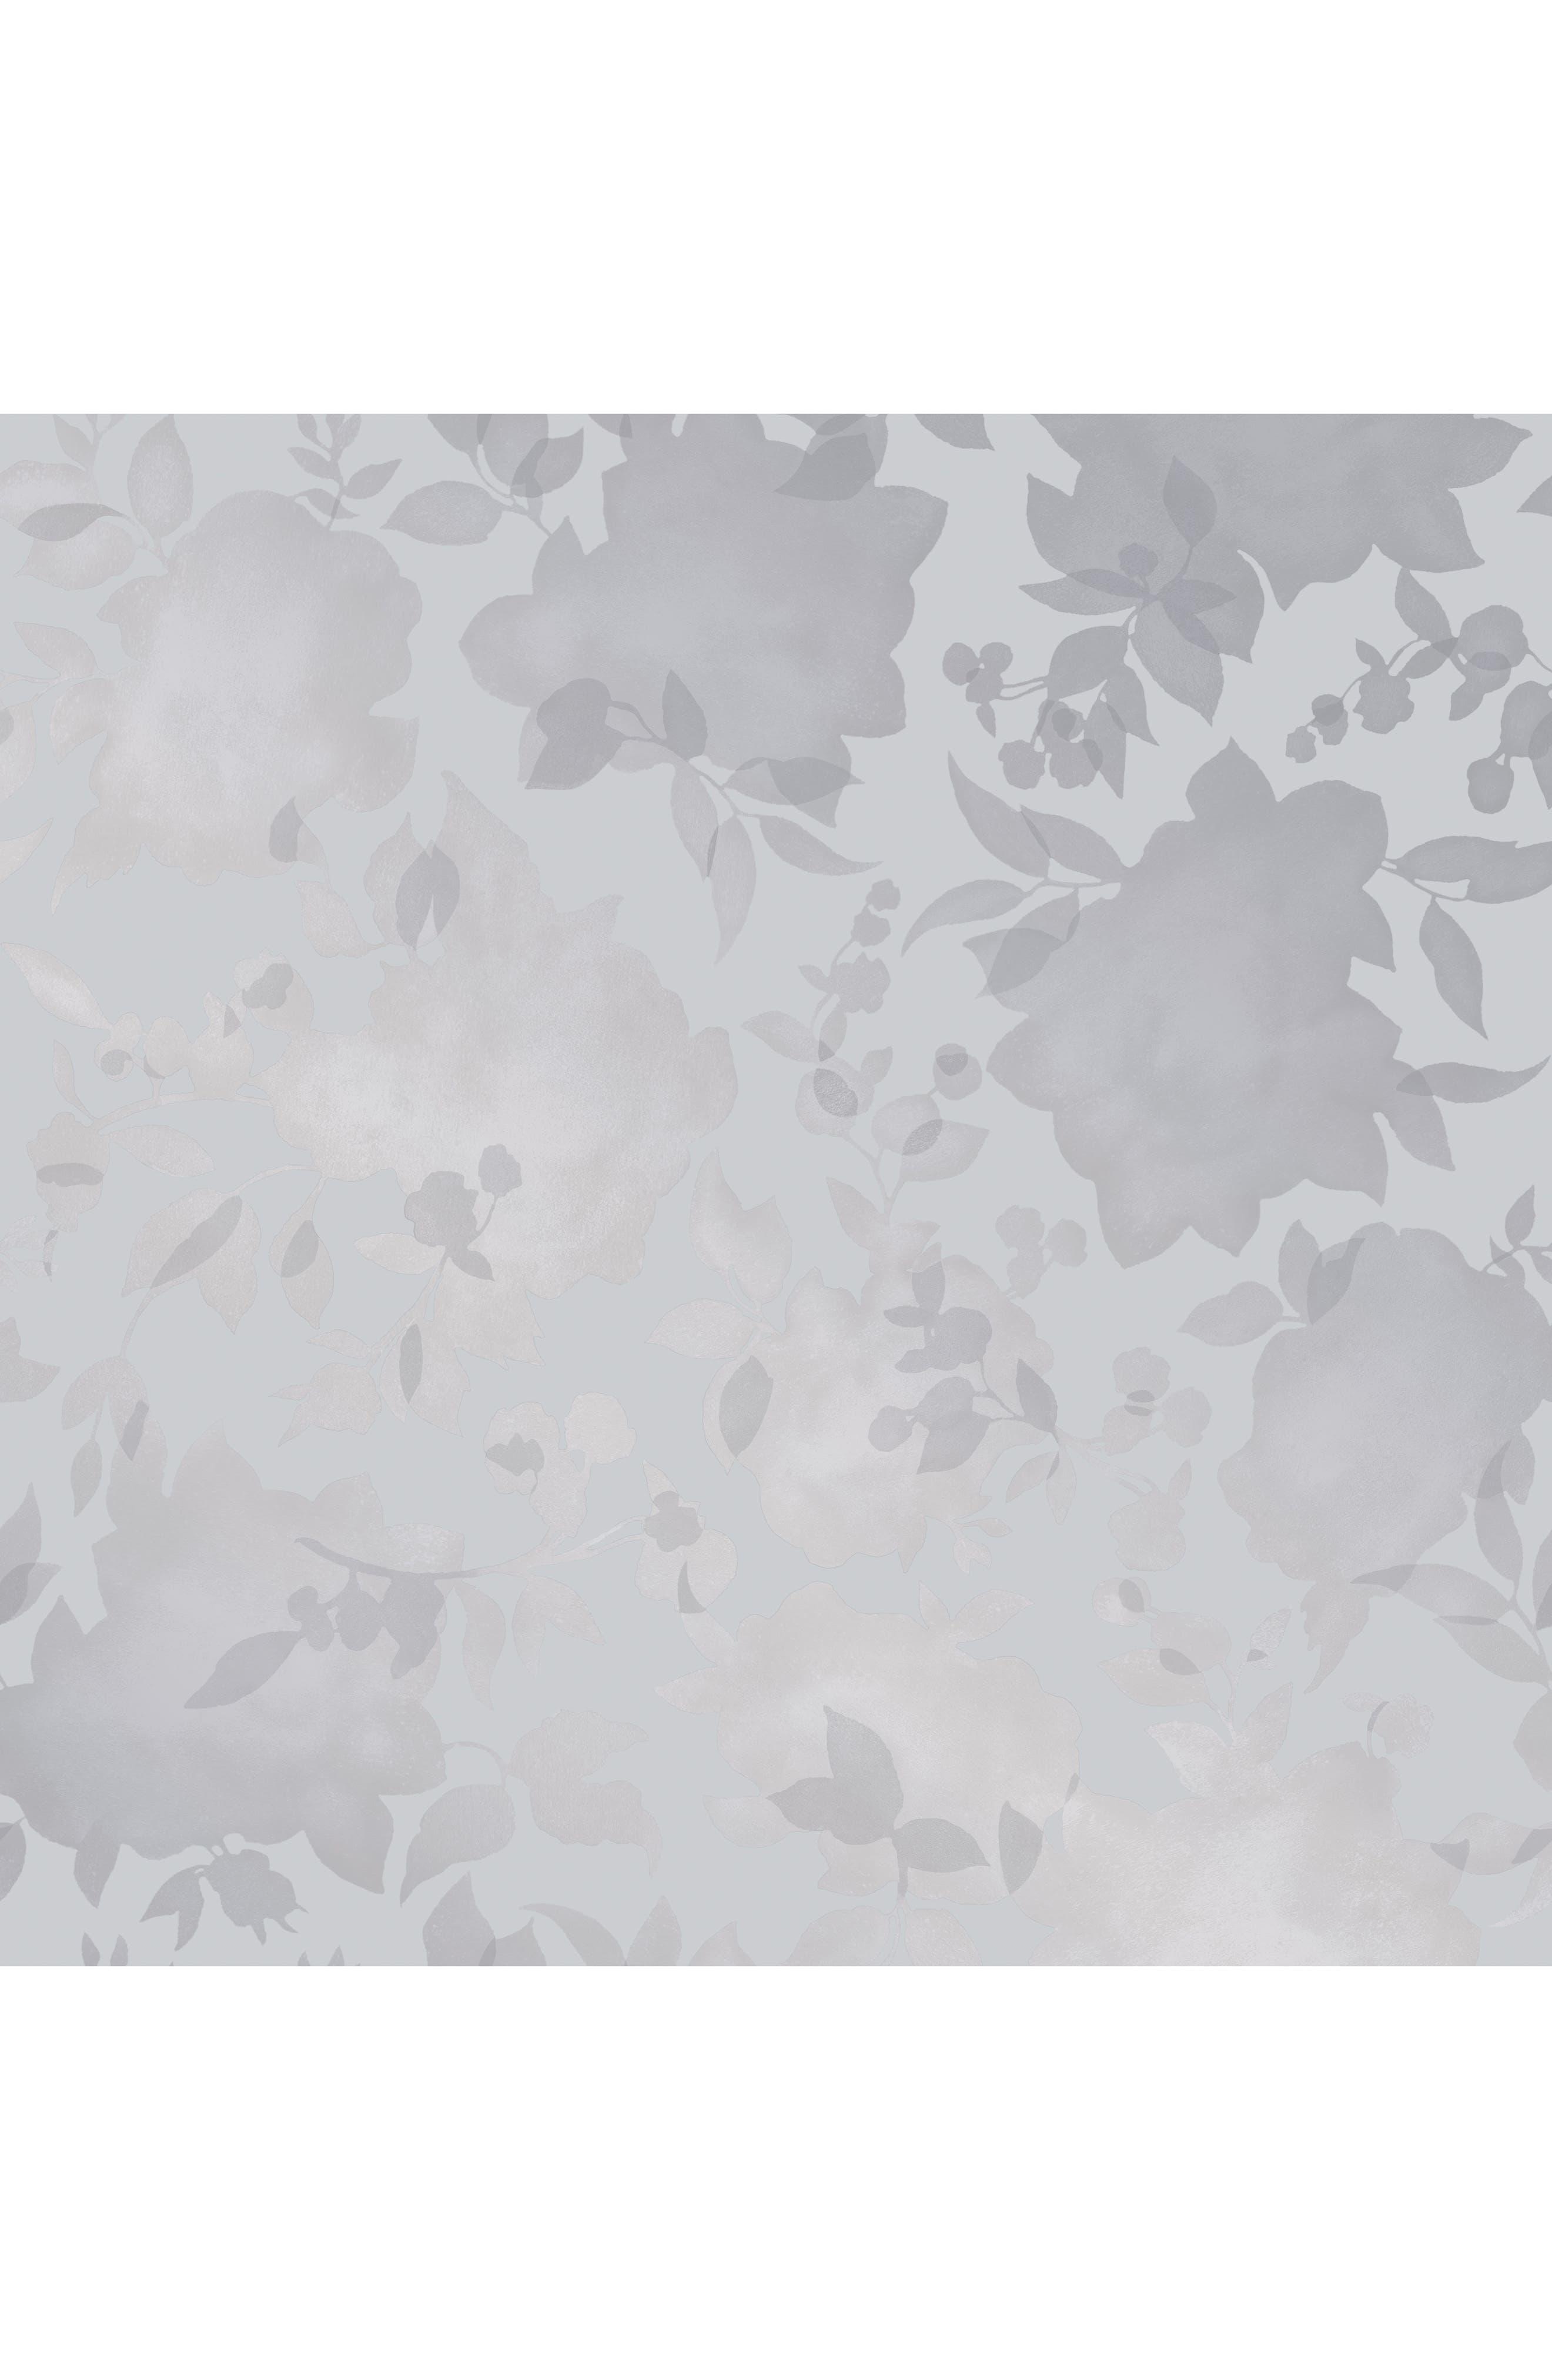 Silhouette Self-Adhesive Vinyl Wallpaper,                             Main thumbnail 1, color,